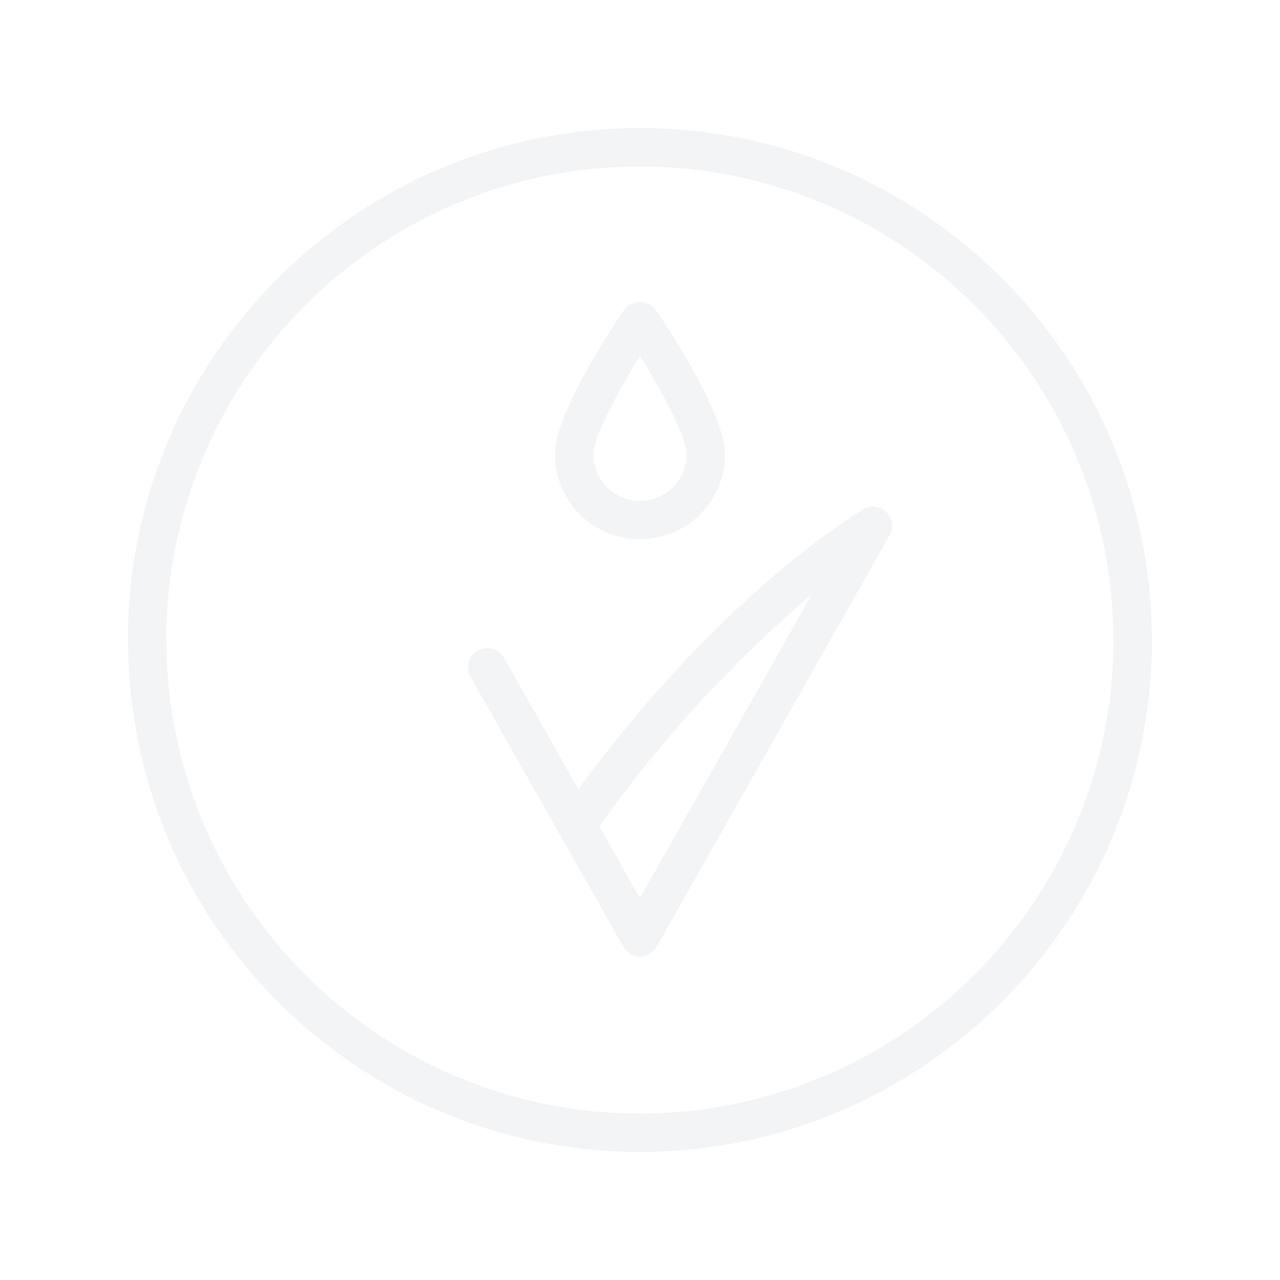 NANSHY Blush Brush White